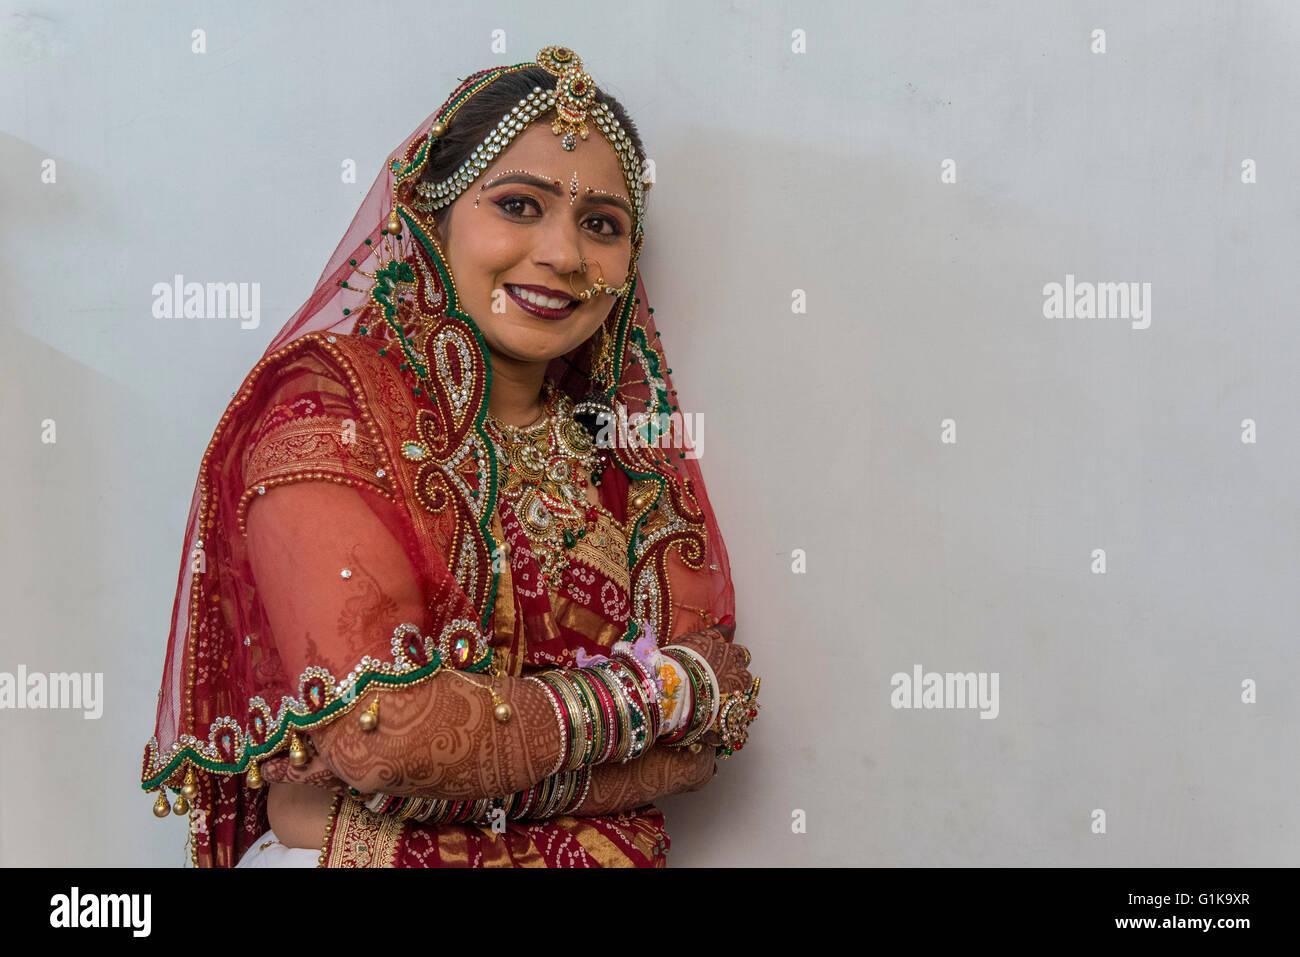 Ahir Bride At Her Wedding, Kutch - Stock Image